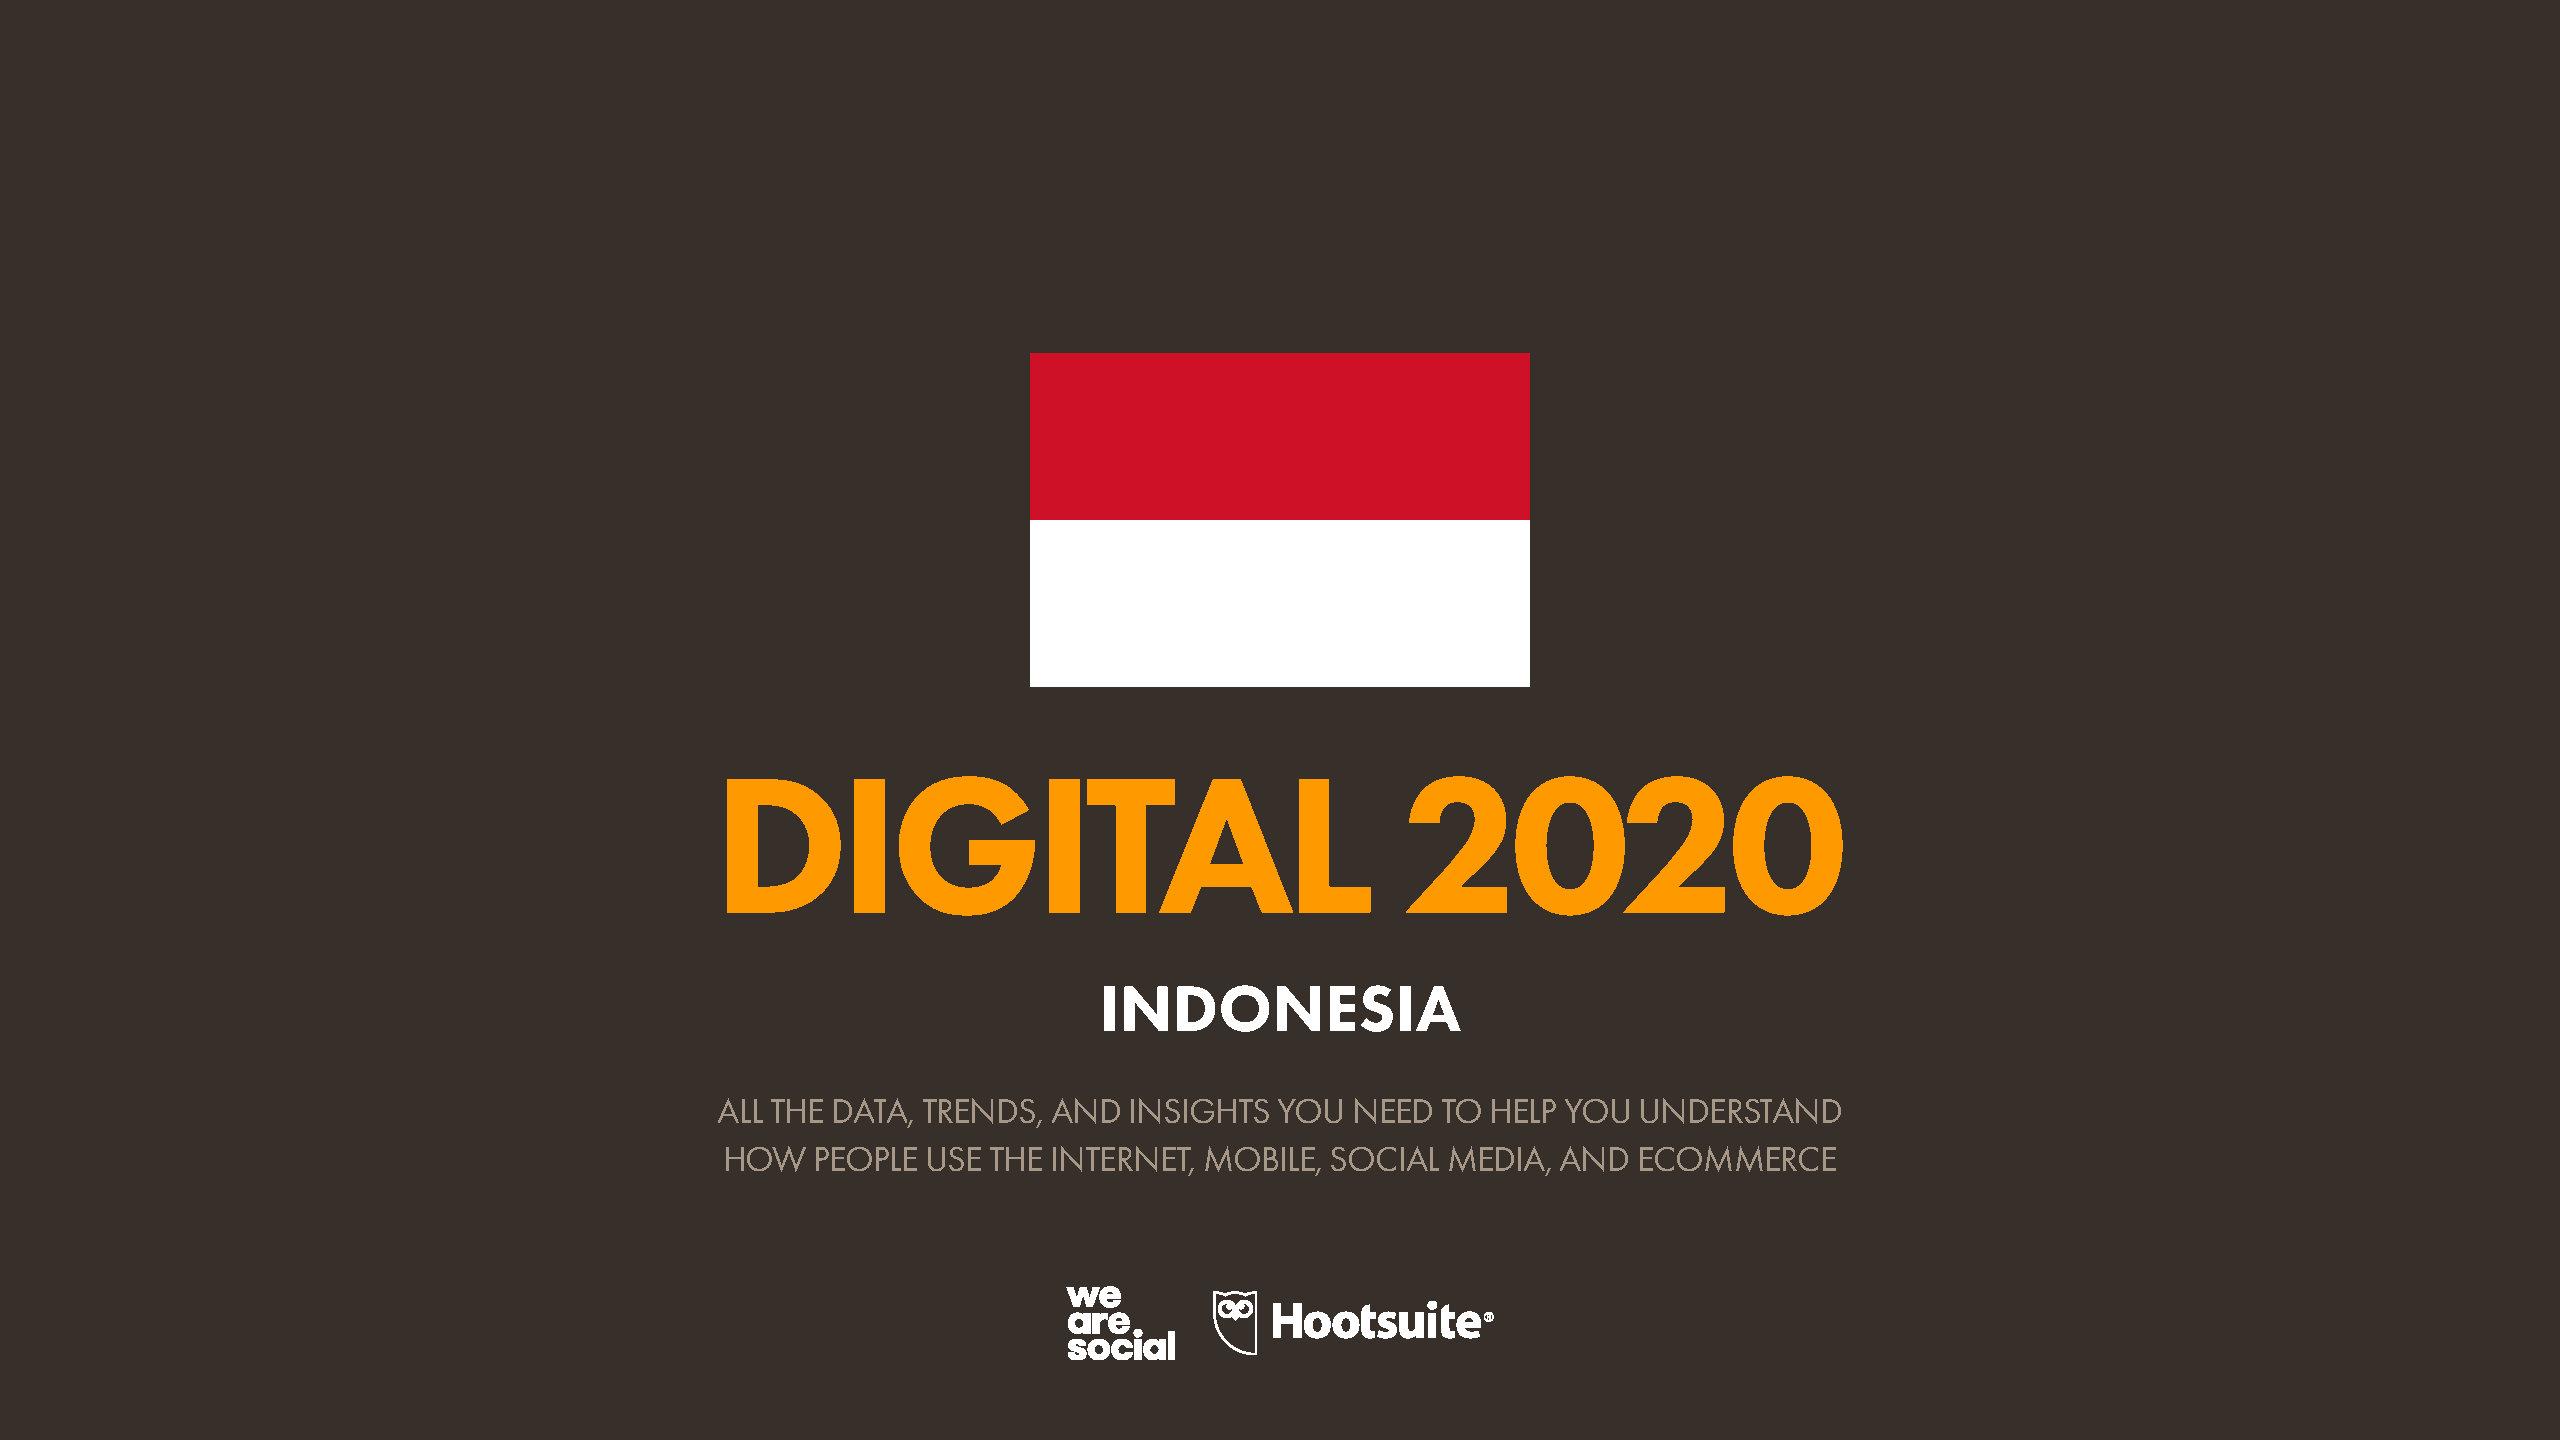 Hootsuite (We are Social) Indonesian Digital Report 2020